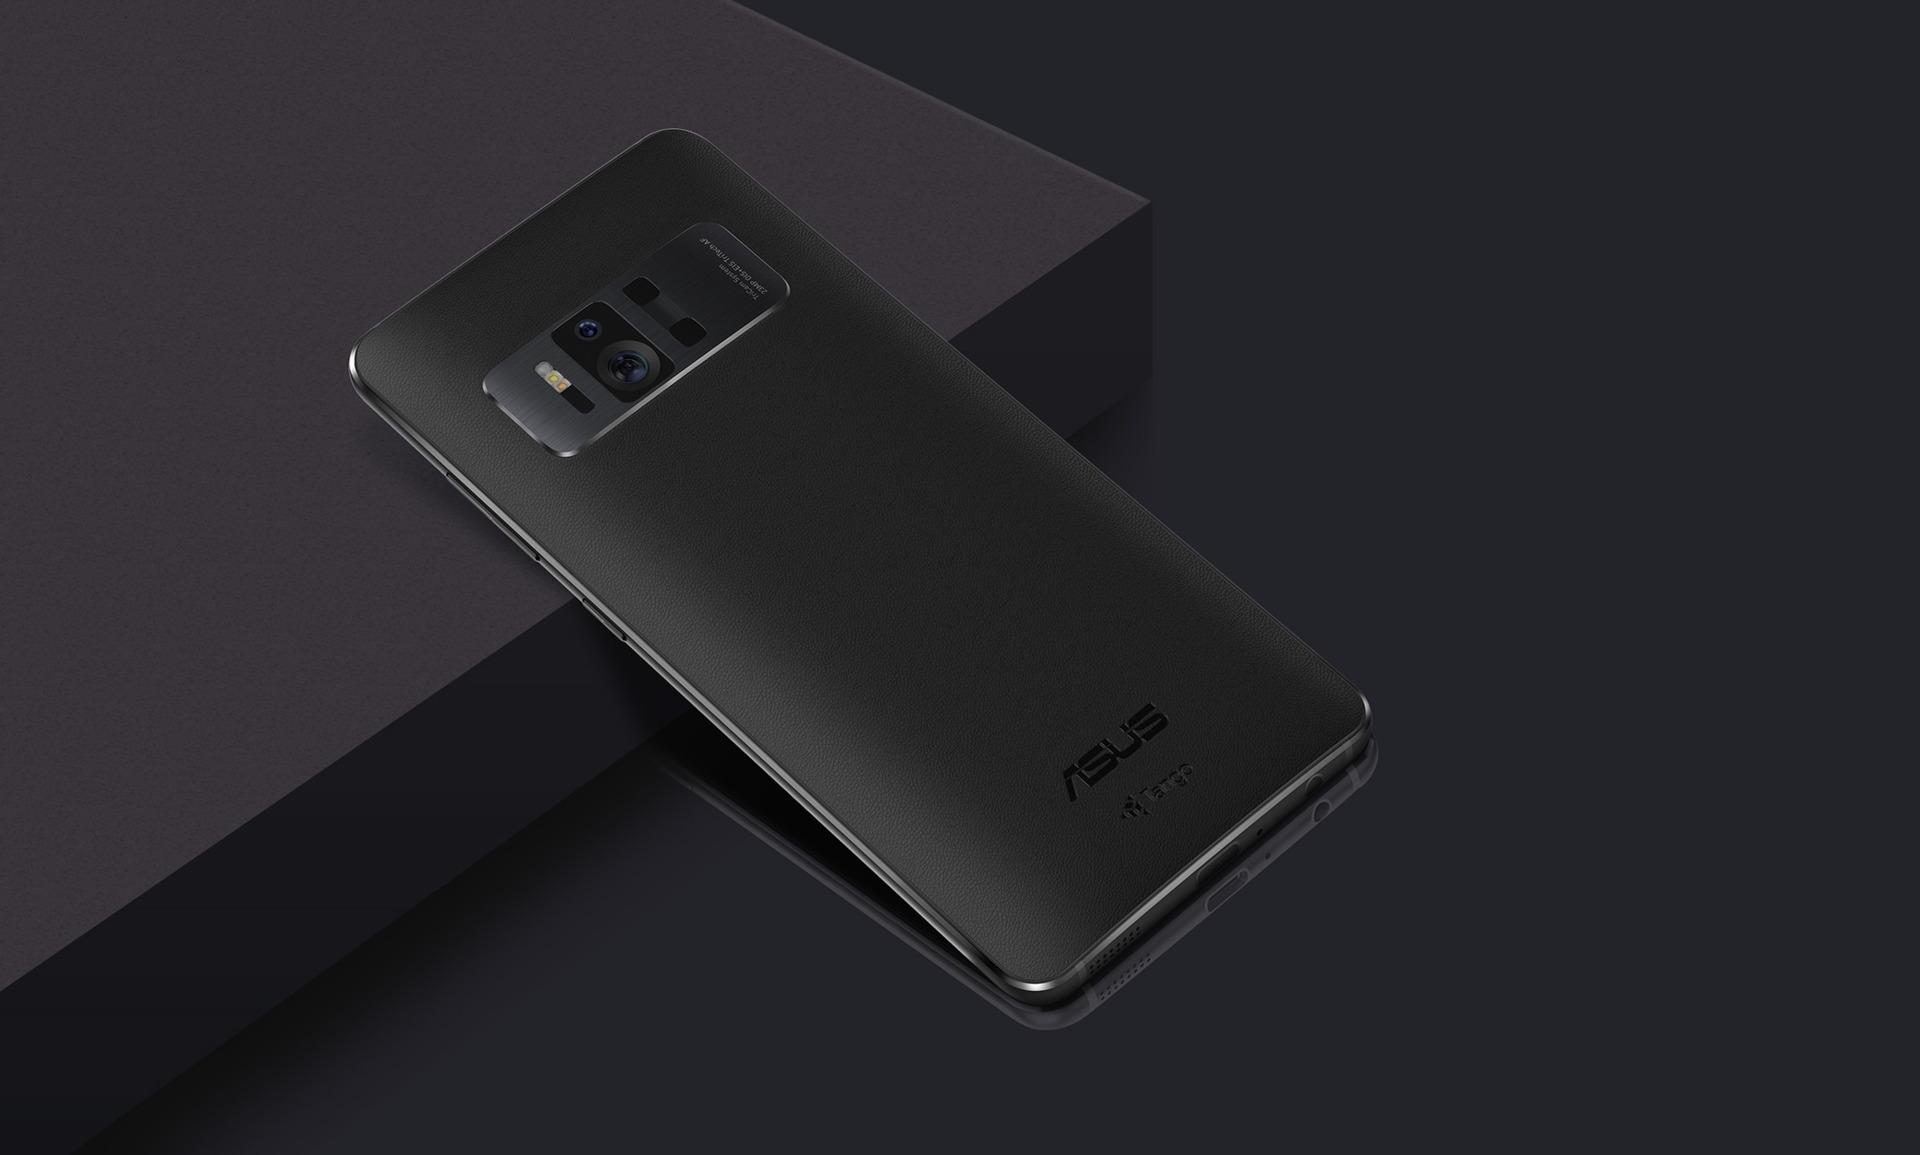 Je to najboljši pametni telefon na svetu?